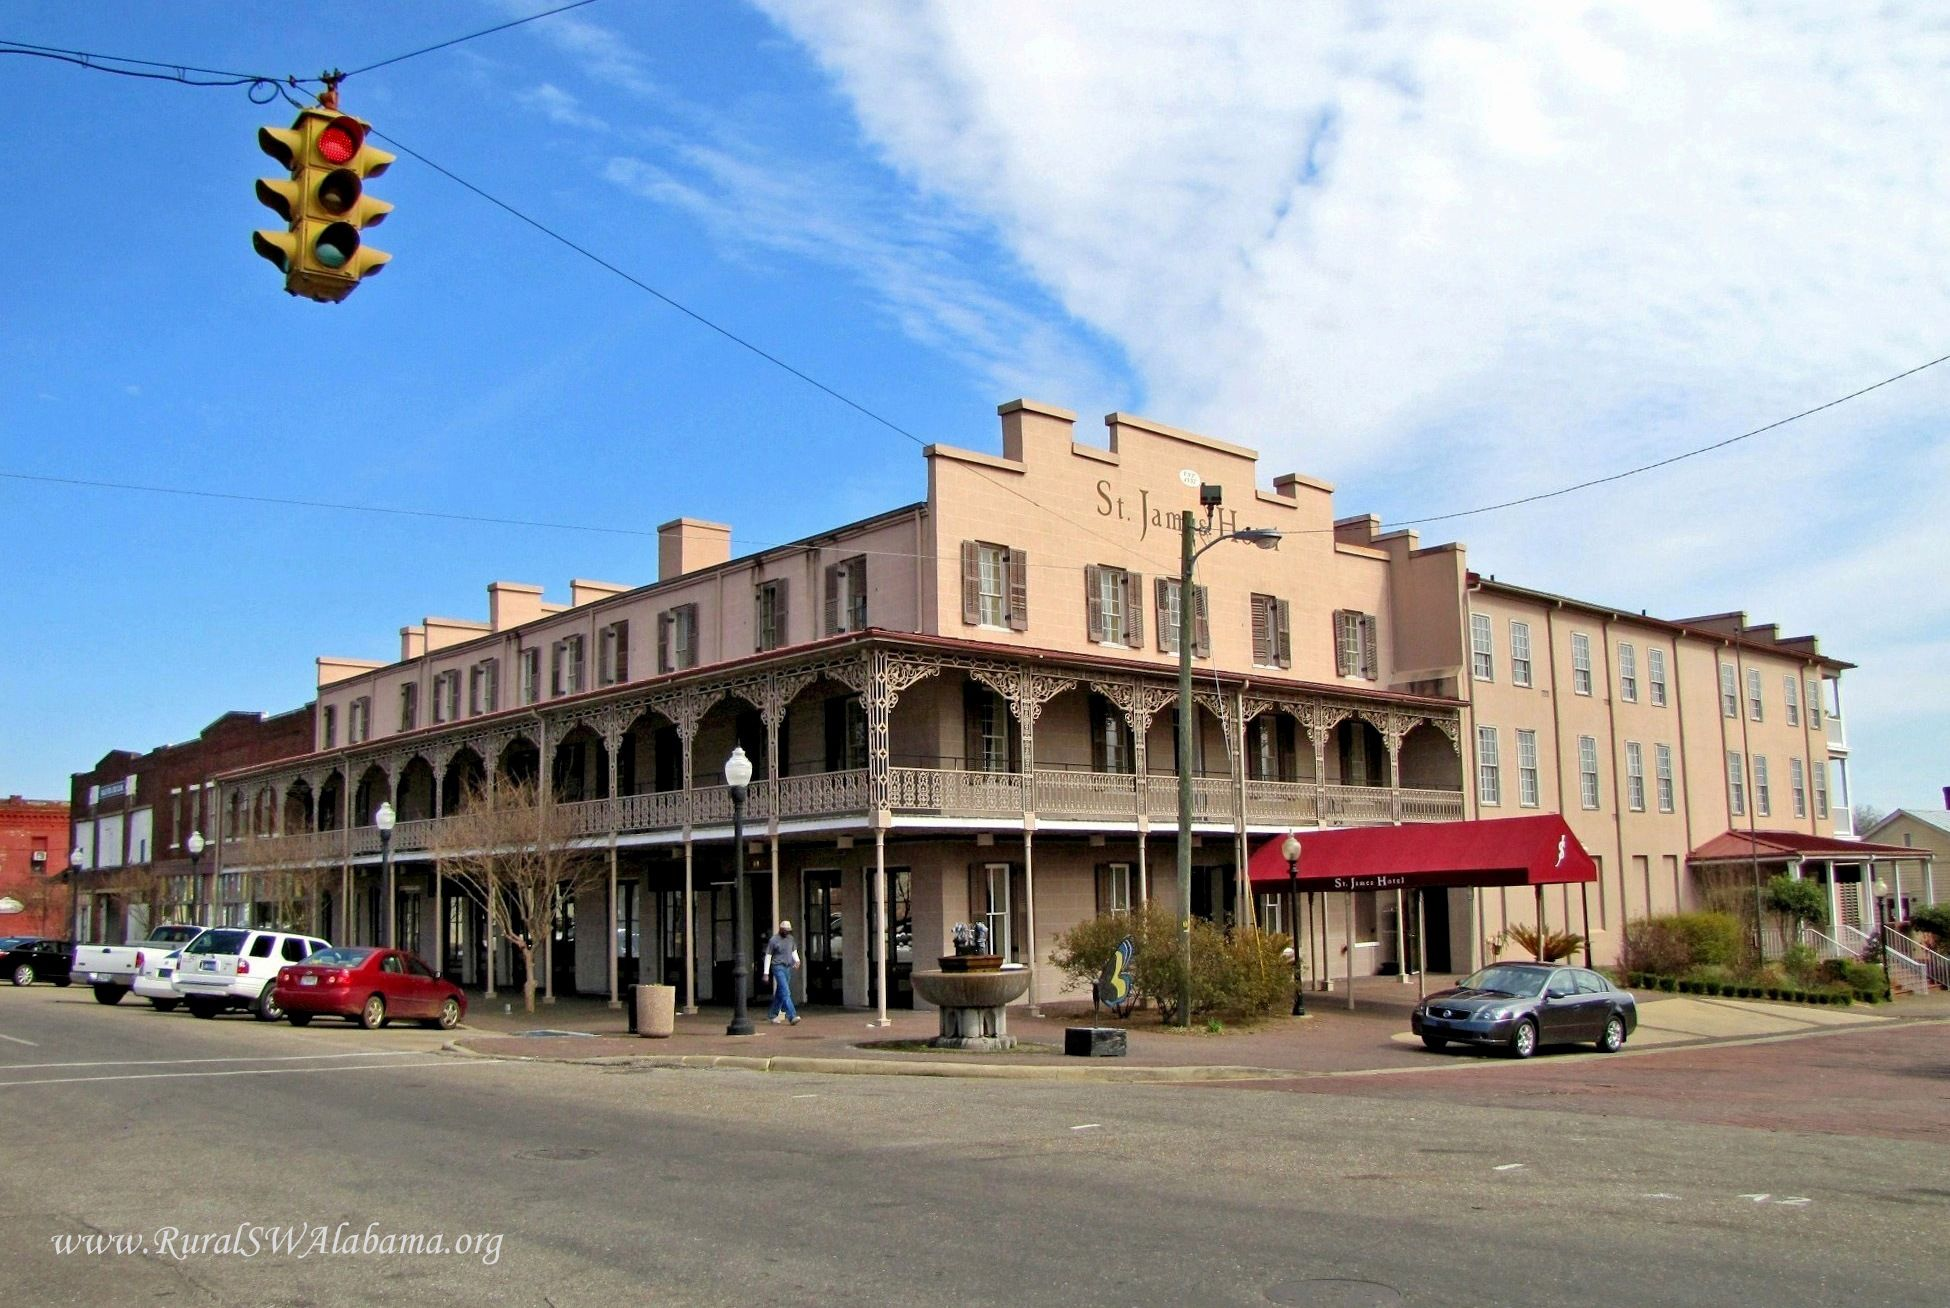 St James Hotel At Selma Al 1837 Rural Southwest Alabama James Hotel St James Hotel Sweet Home Alabama